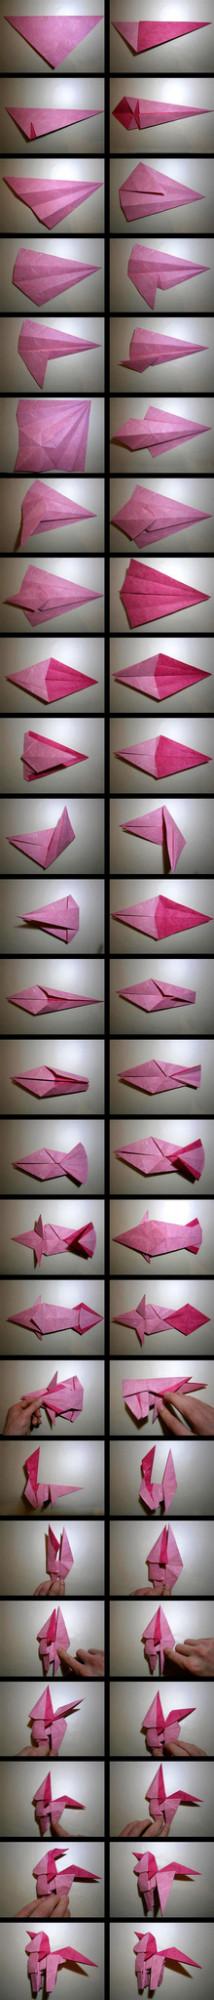 пони оригами диаграмма